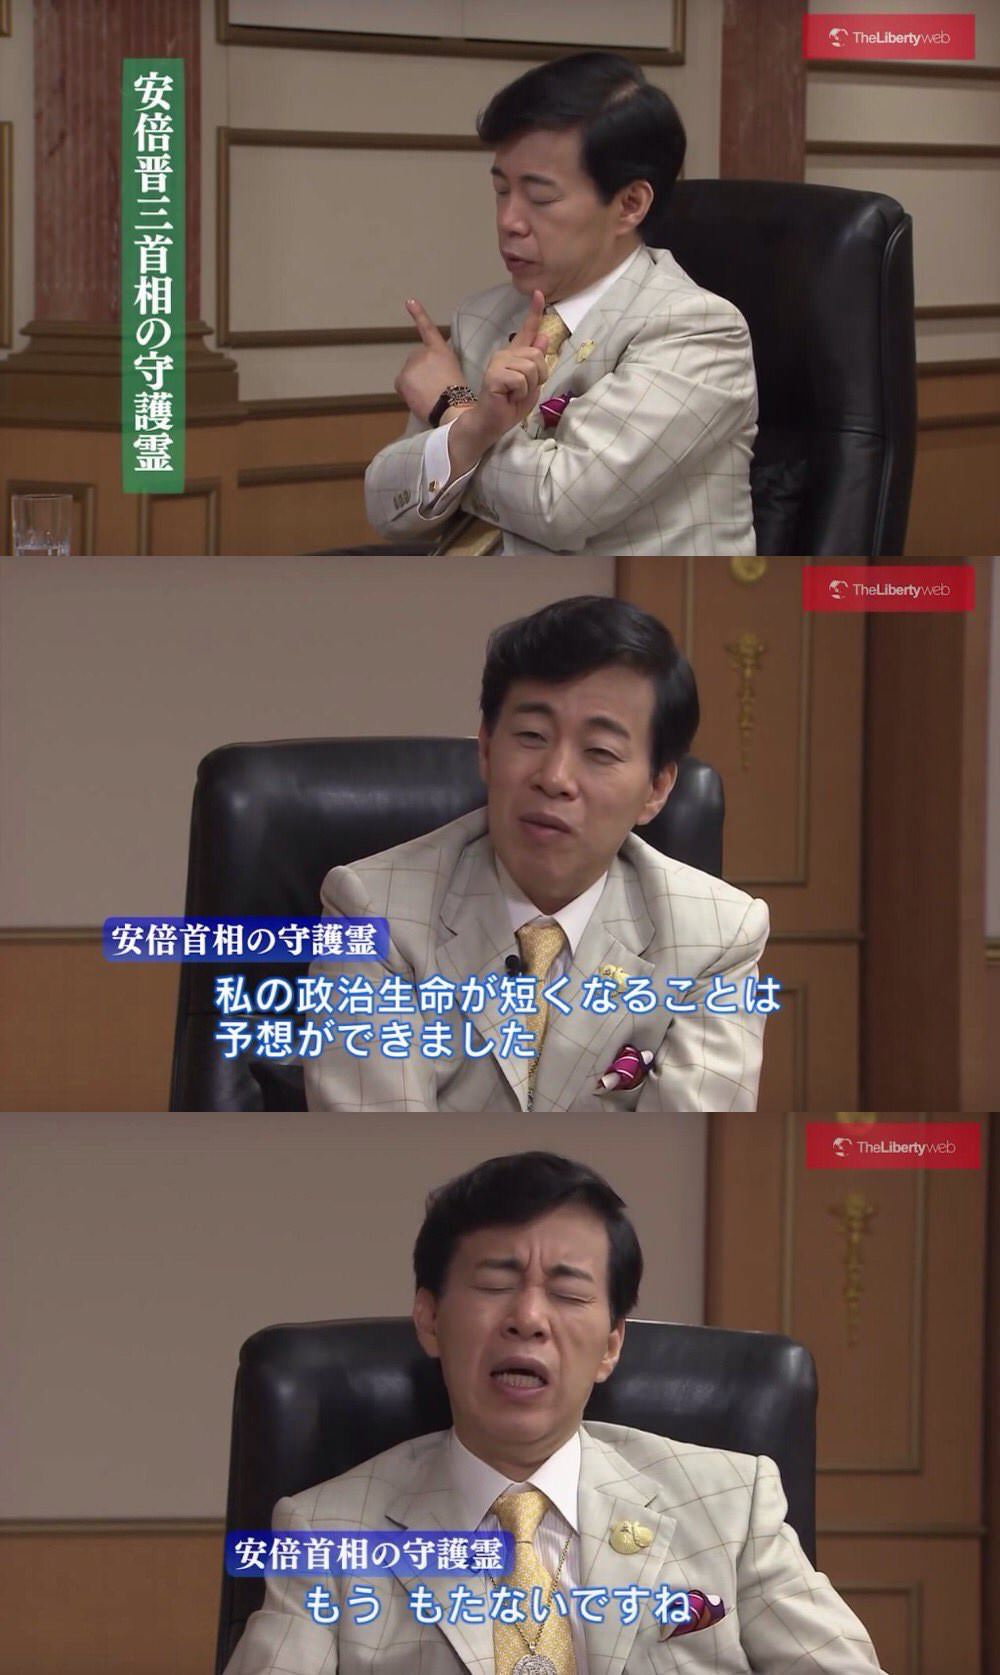 【衝撃】安倍首相の「守護霊」が重大発表wwwwwwwwwwwwwwwwwwwのサムネイル画像